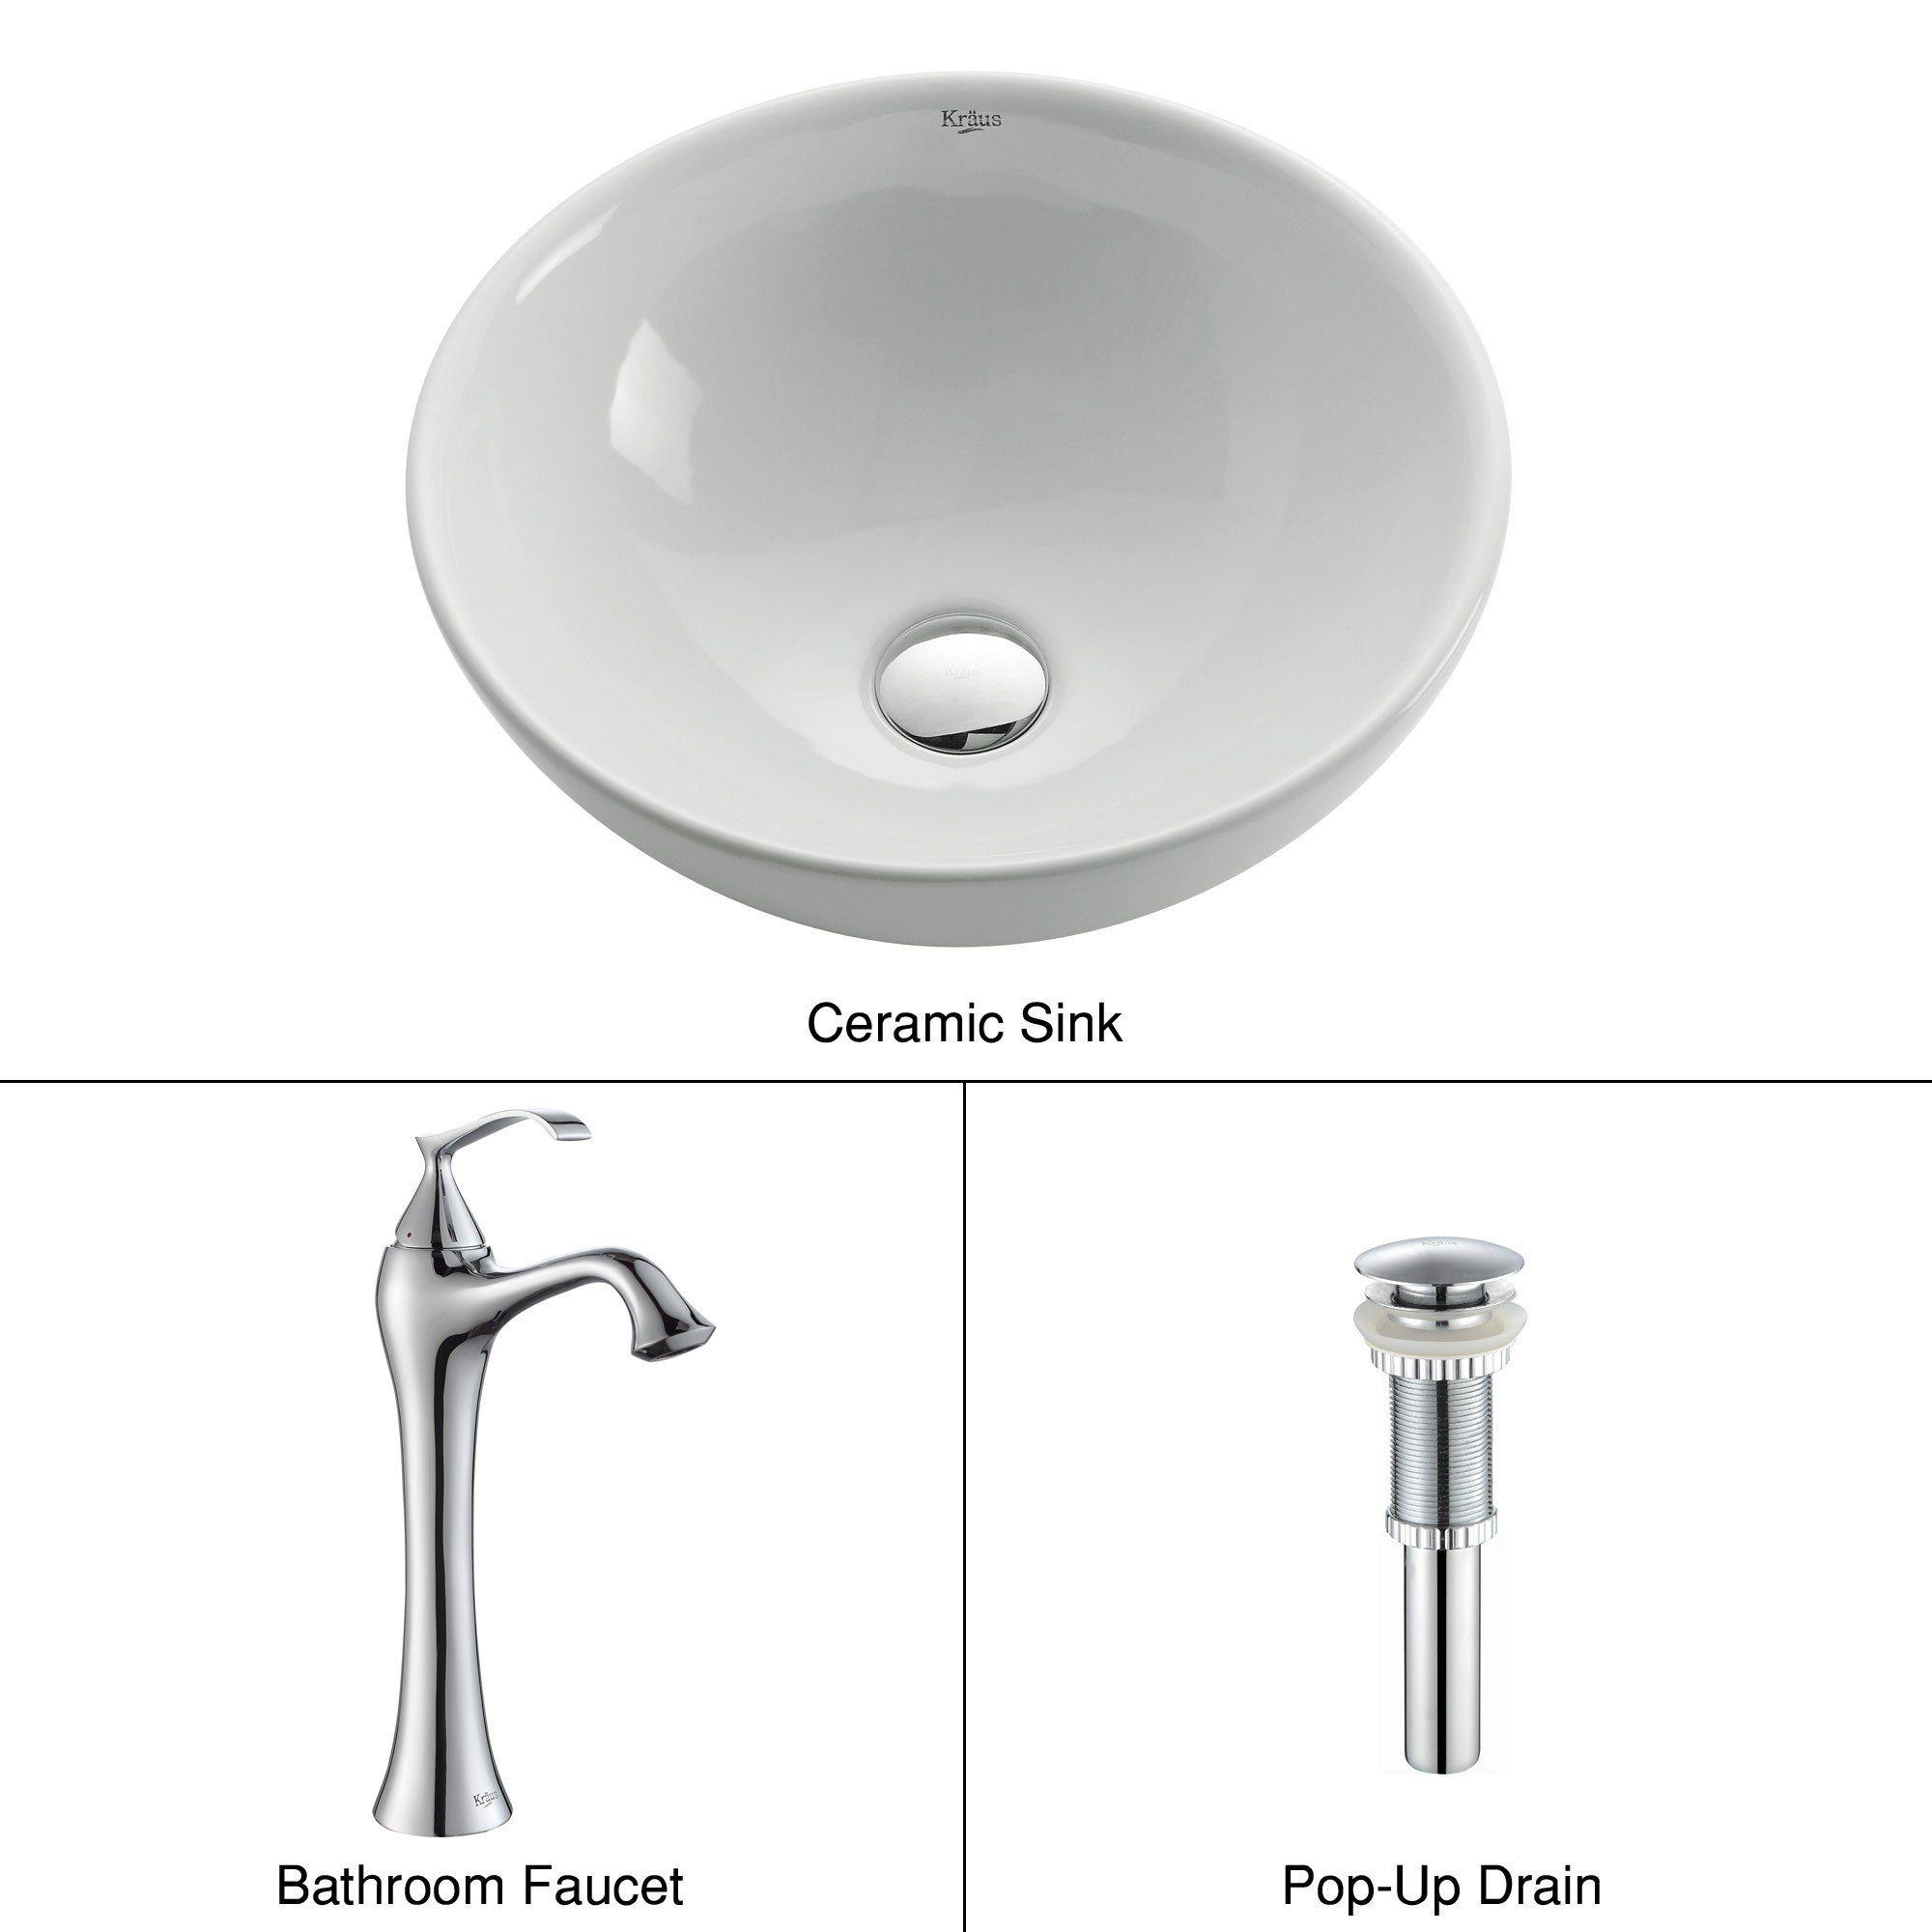 Kraus C-KCV-141-15000CH White Round Ceramic Sink and Ventus Faucet Chrome